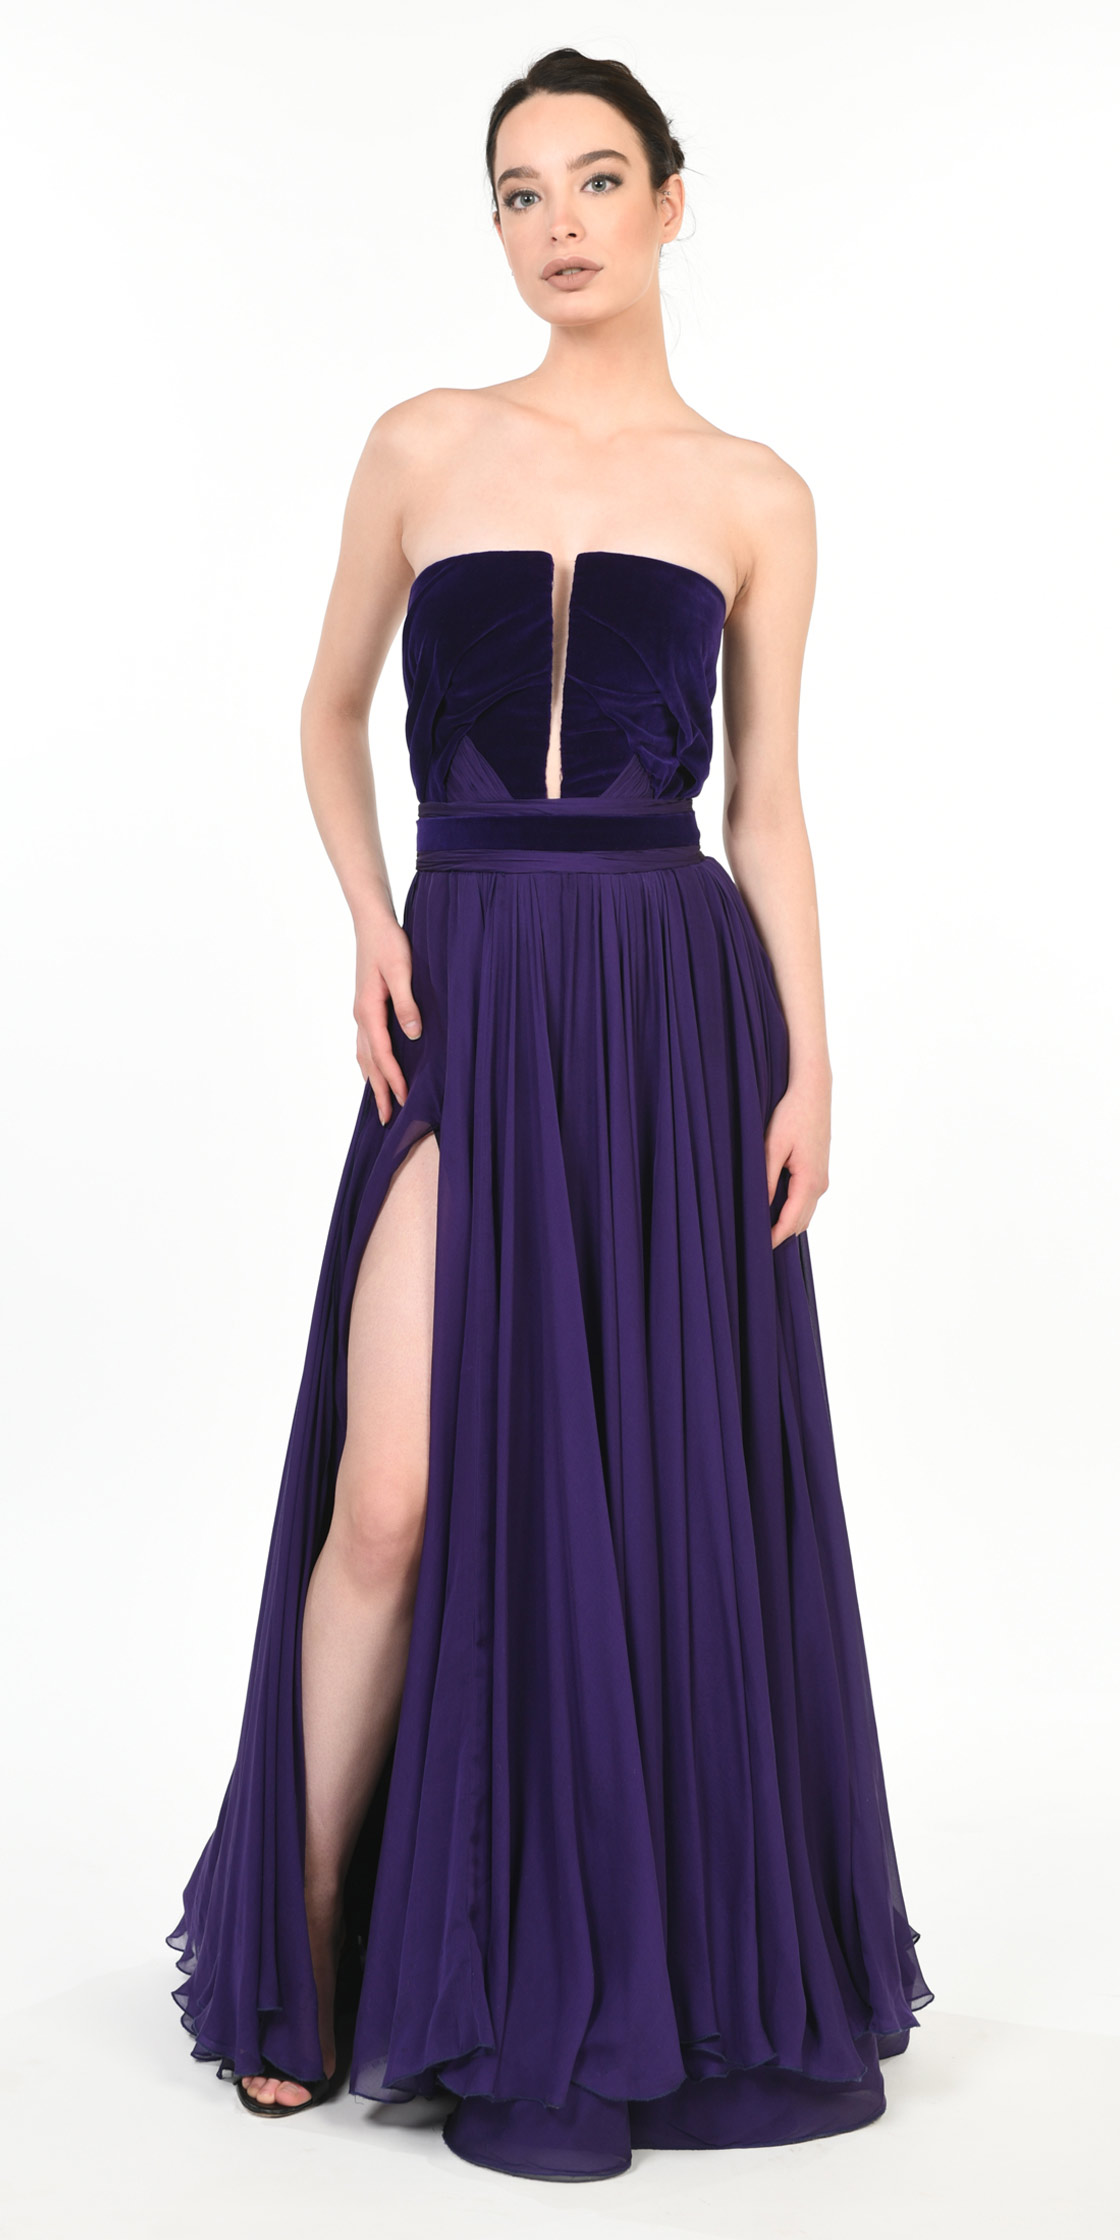 Rent ANTOINE EL KAREH Strapless Plunge Neckline Gown Sold in ... 0435150ce